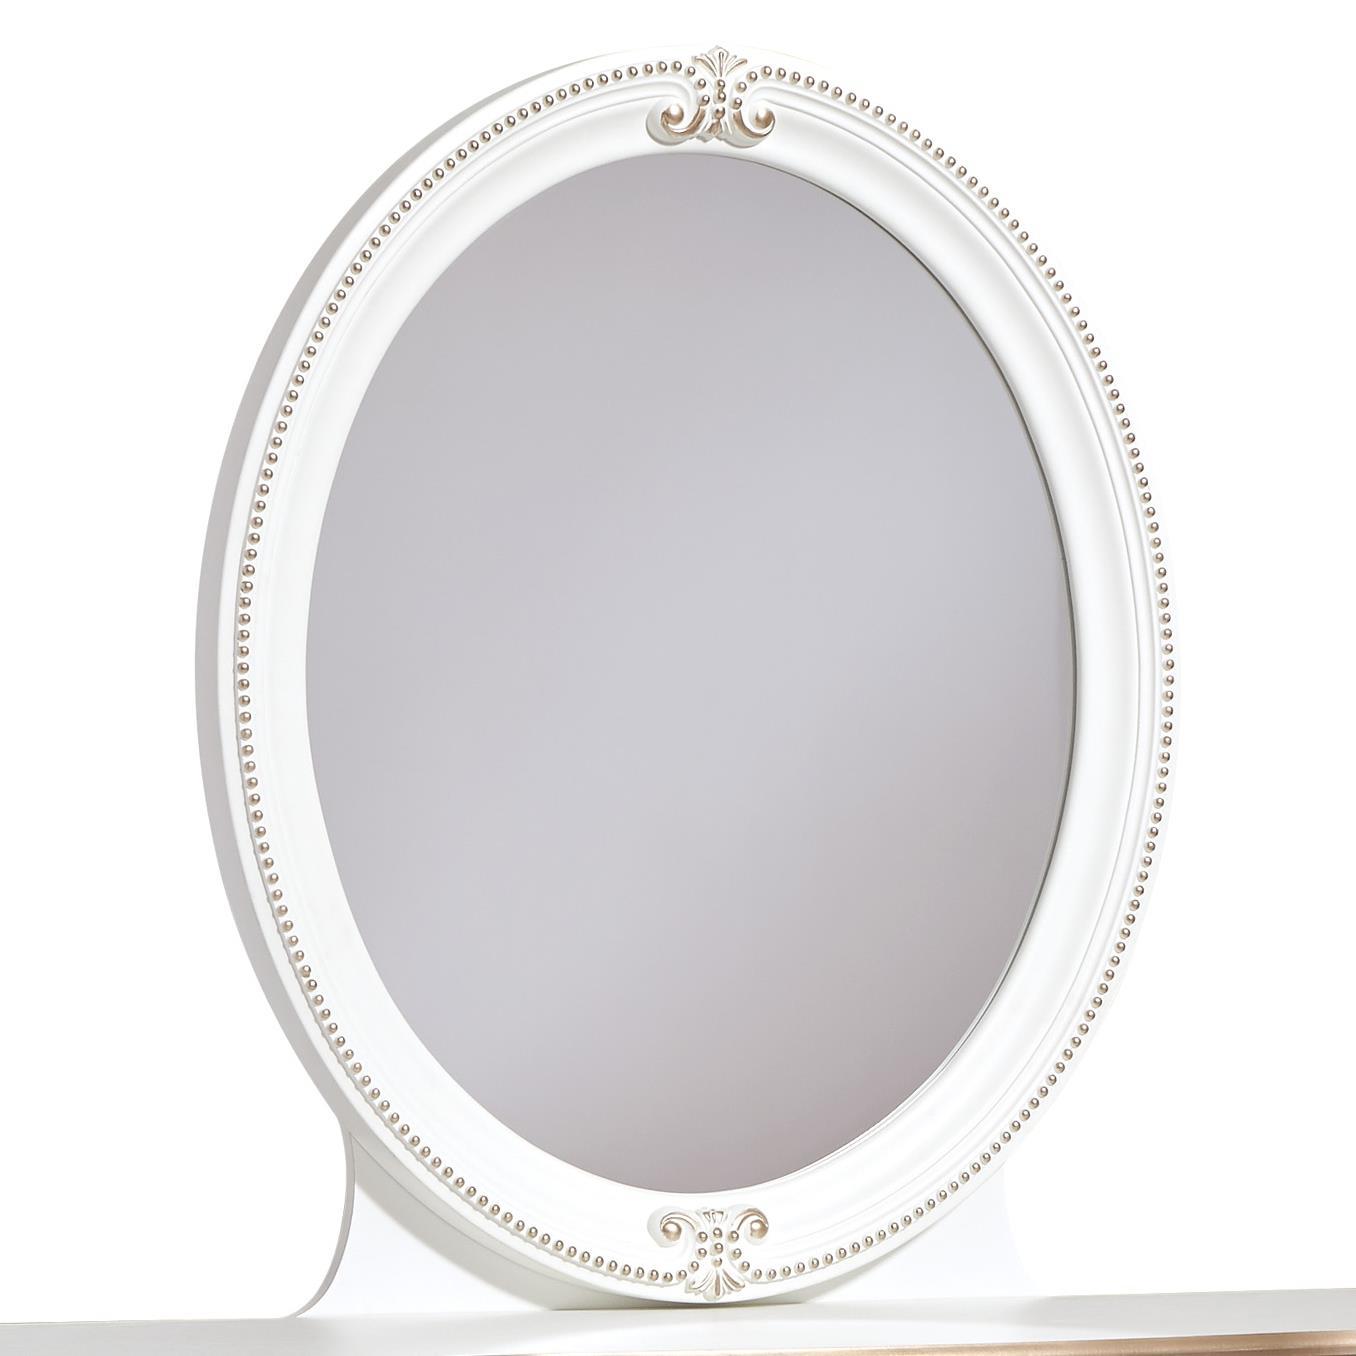 Signature Design by Ashley Korabella Bedroom Mirror - Item Number: B355-26